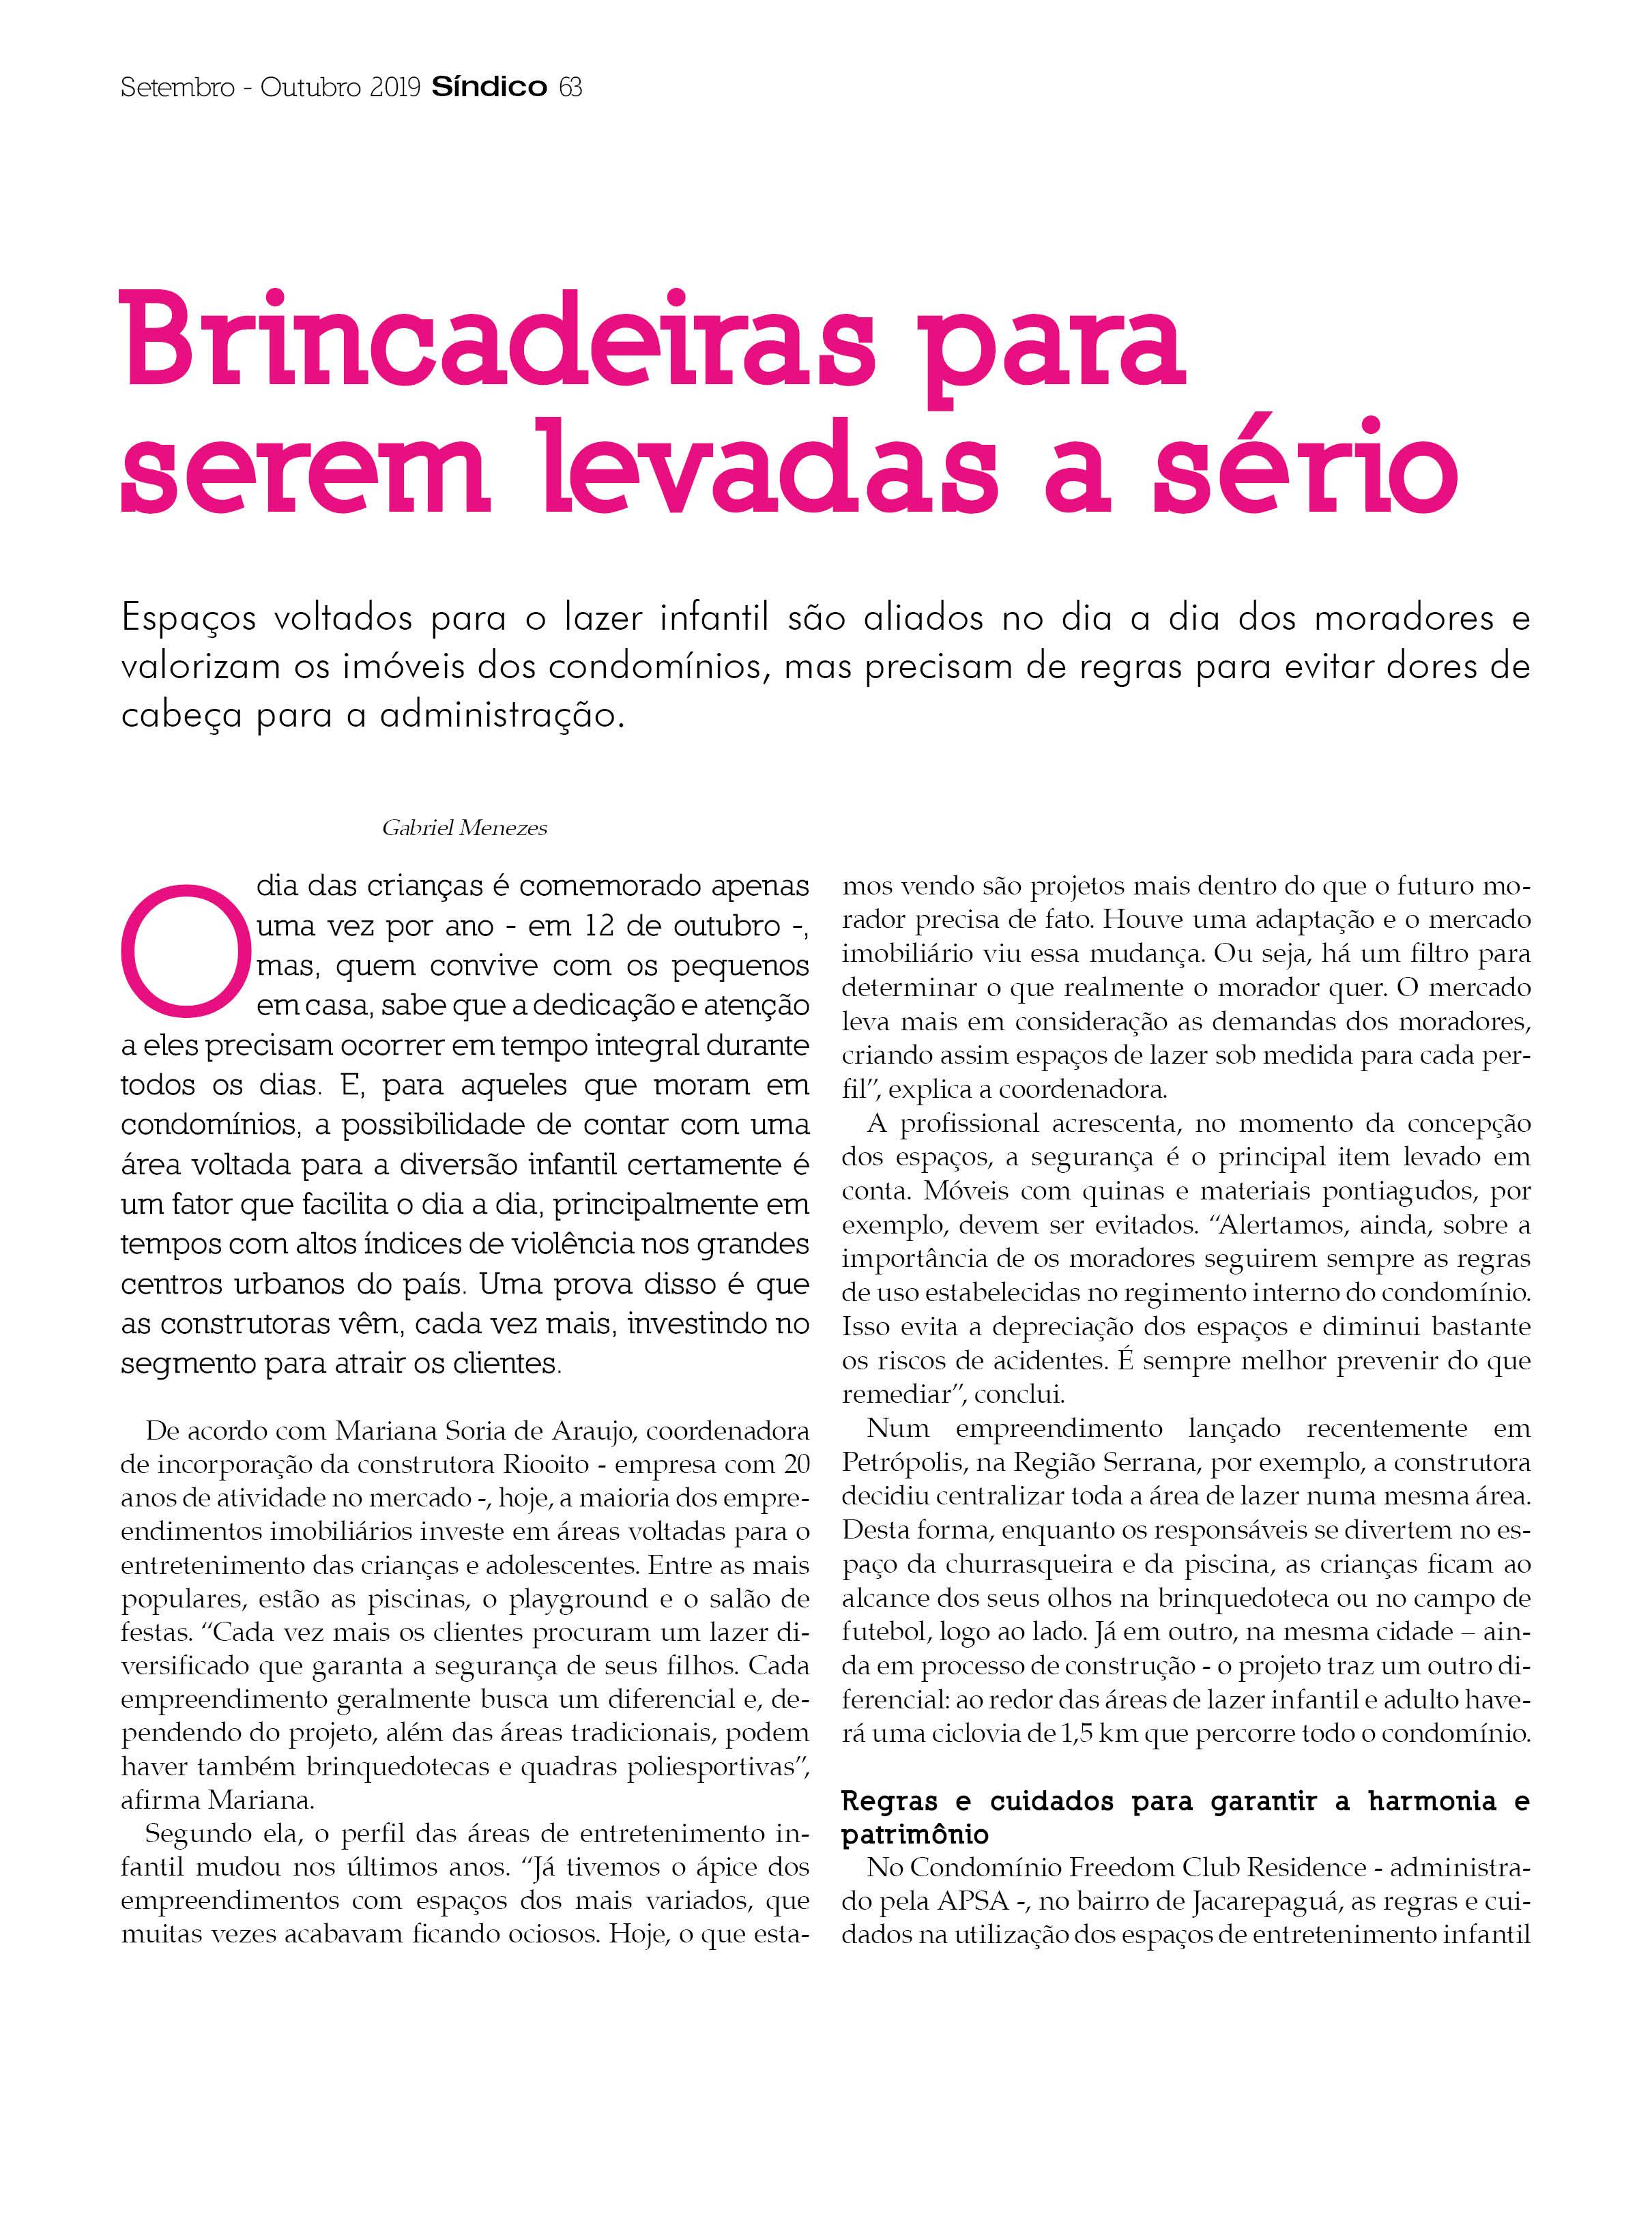 Revista Síndico_ed 246_61